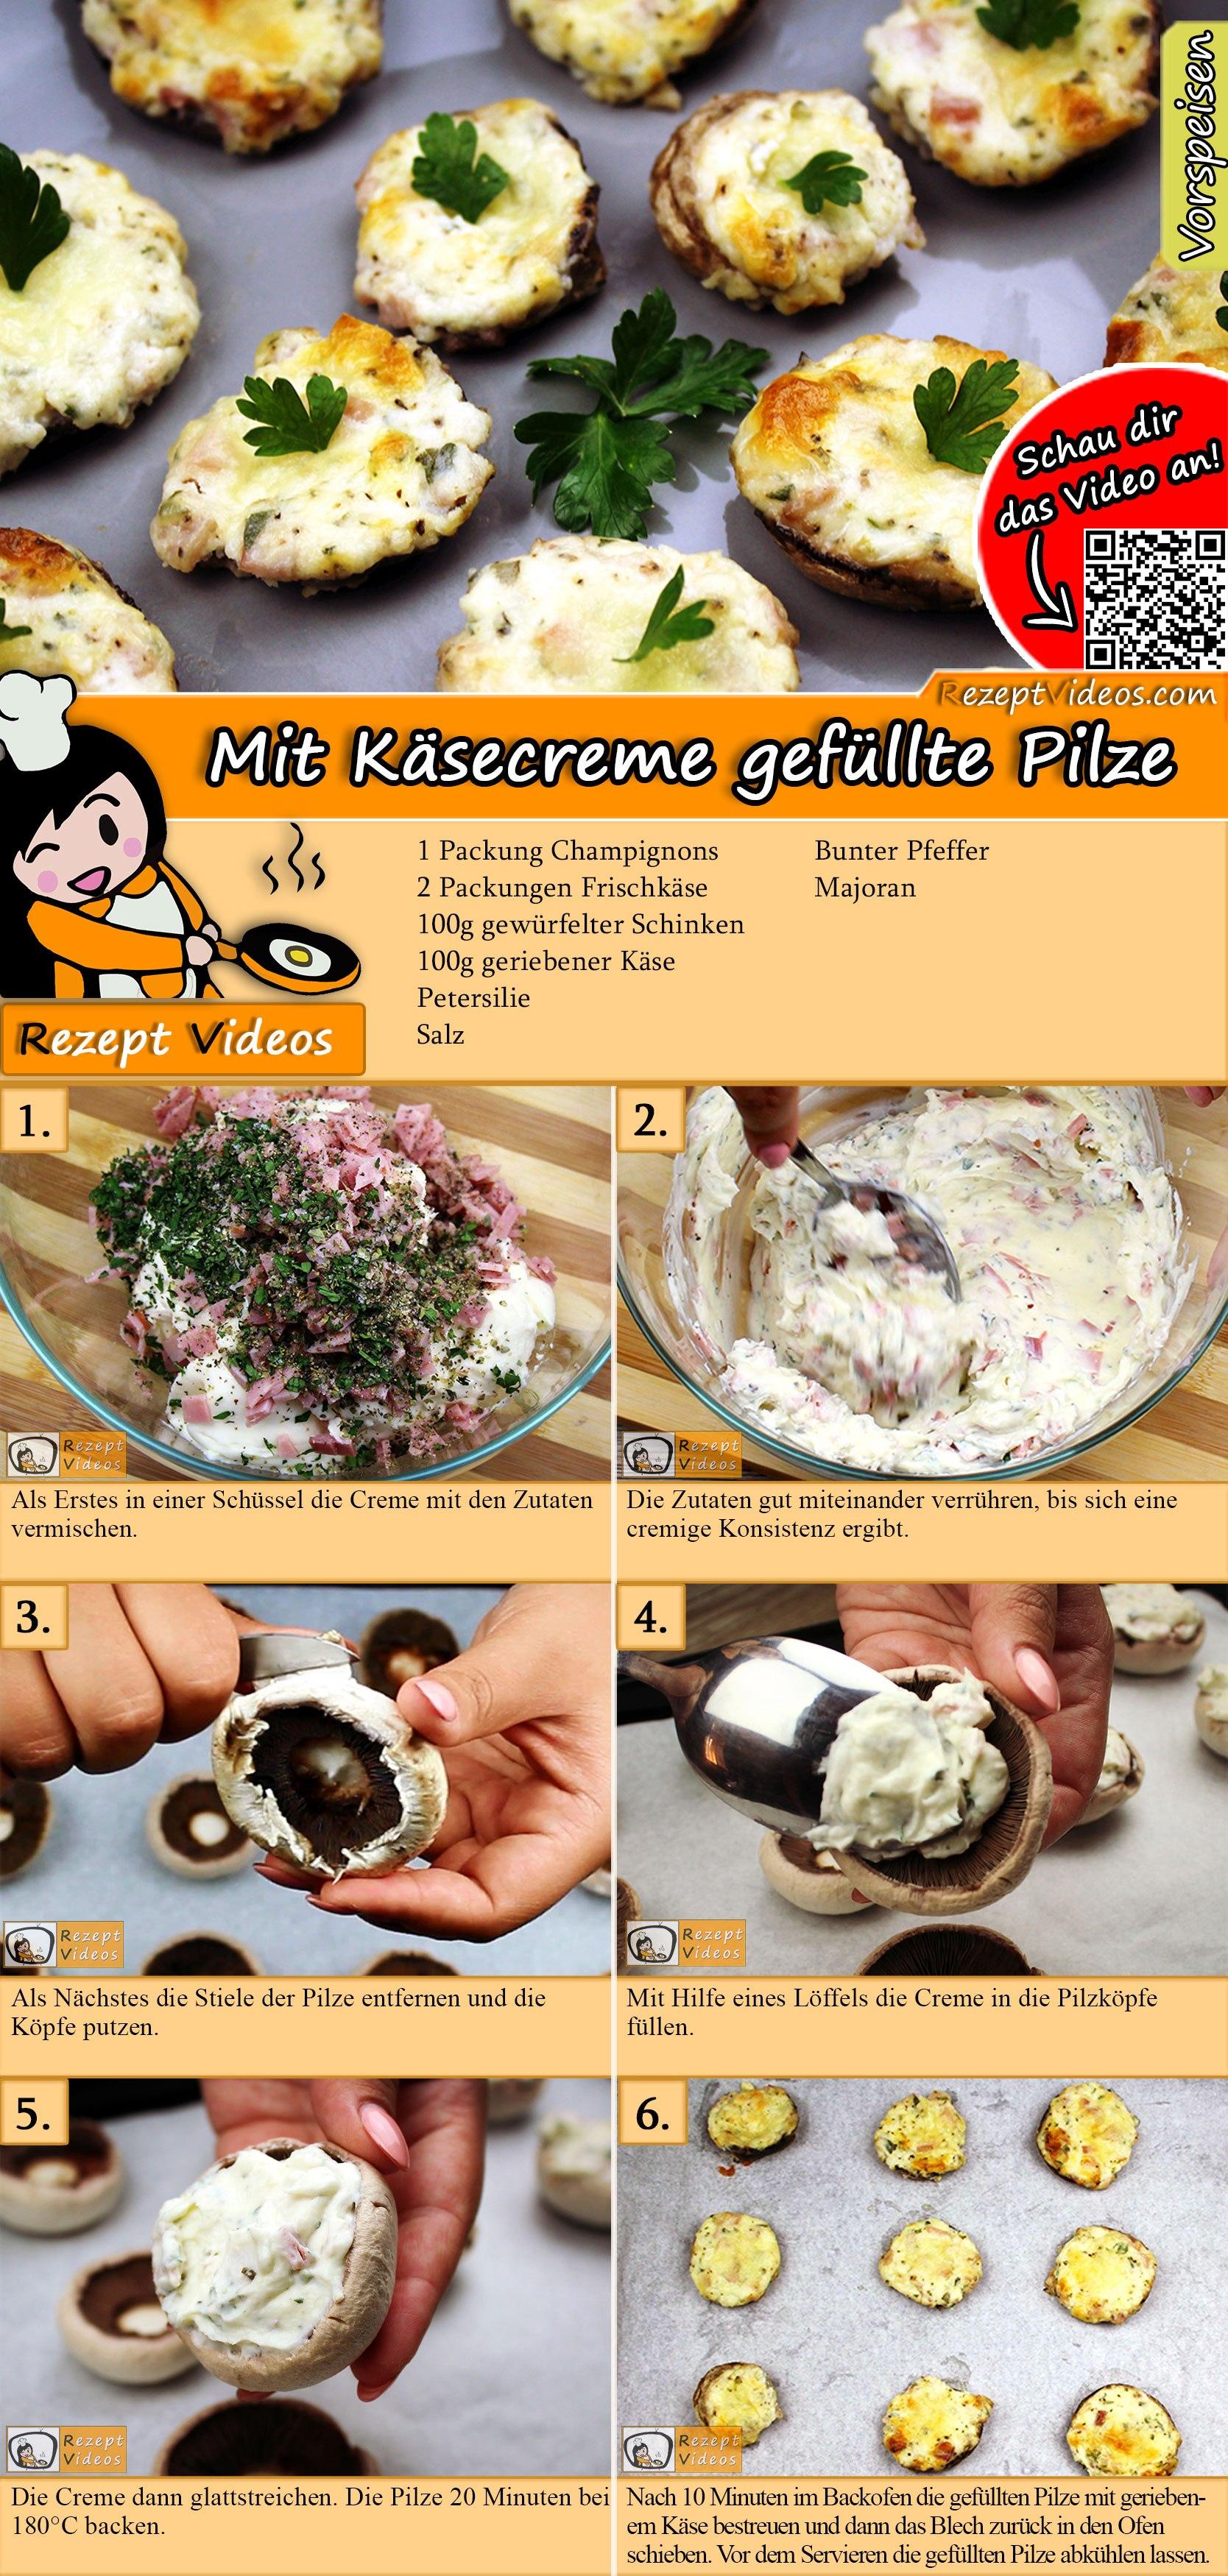 Mit Käsecreme gefüllte Pilze Rezept mit Video